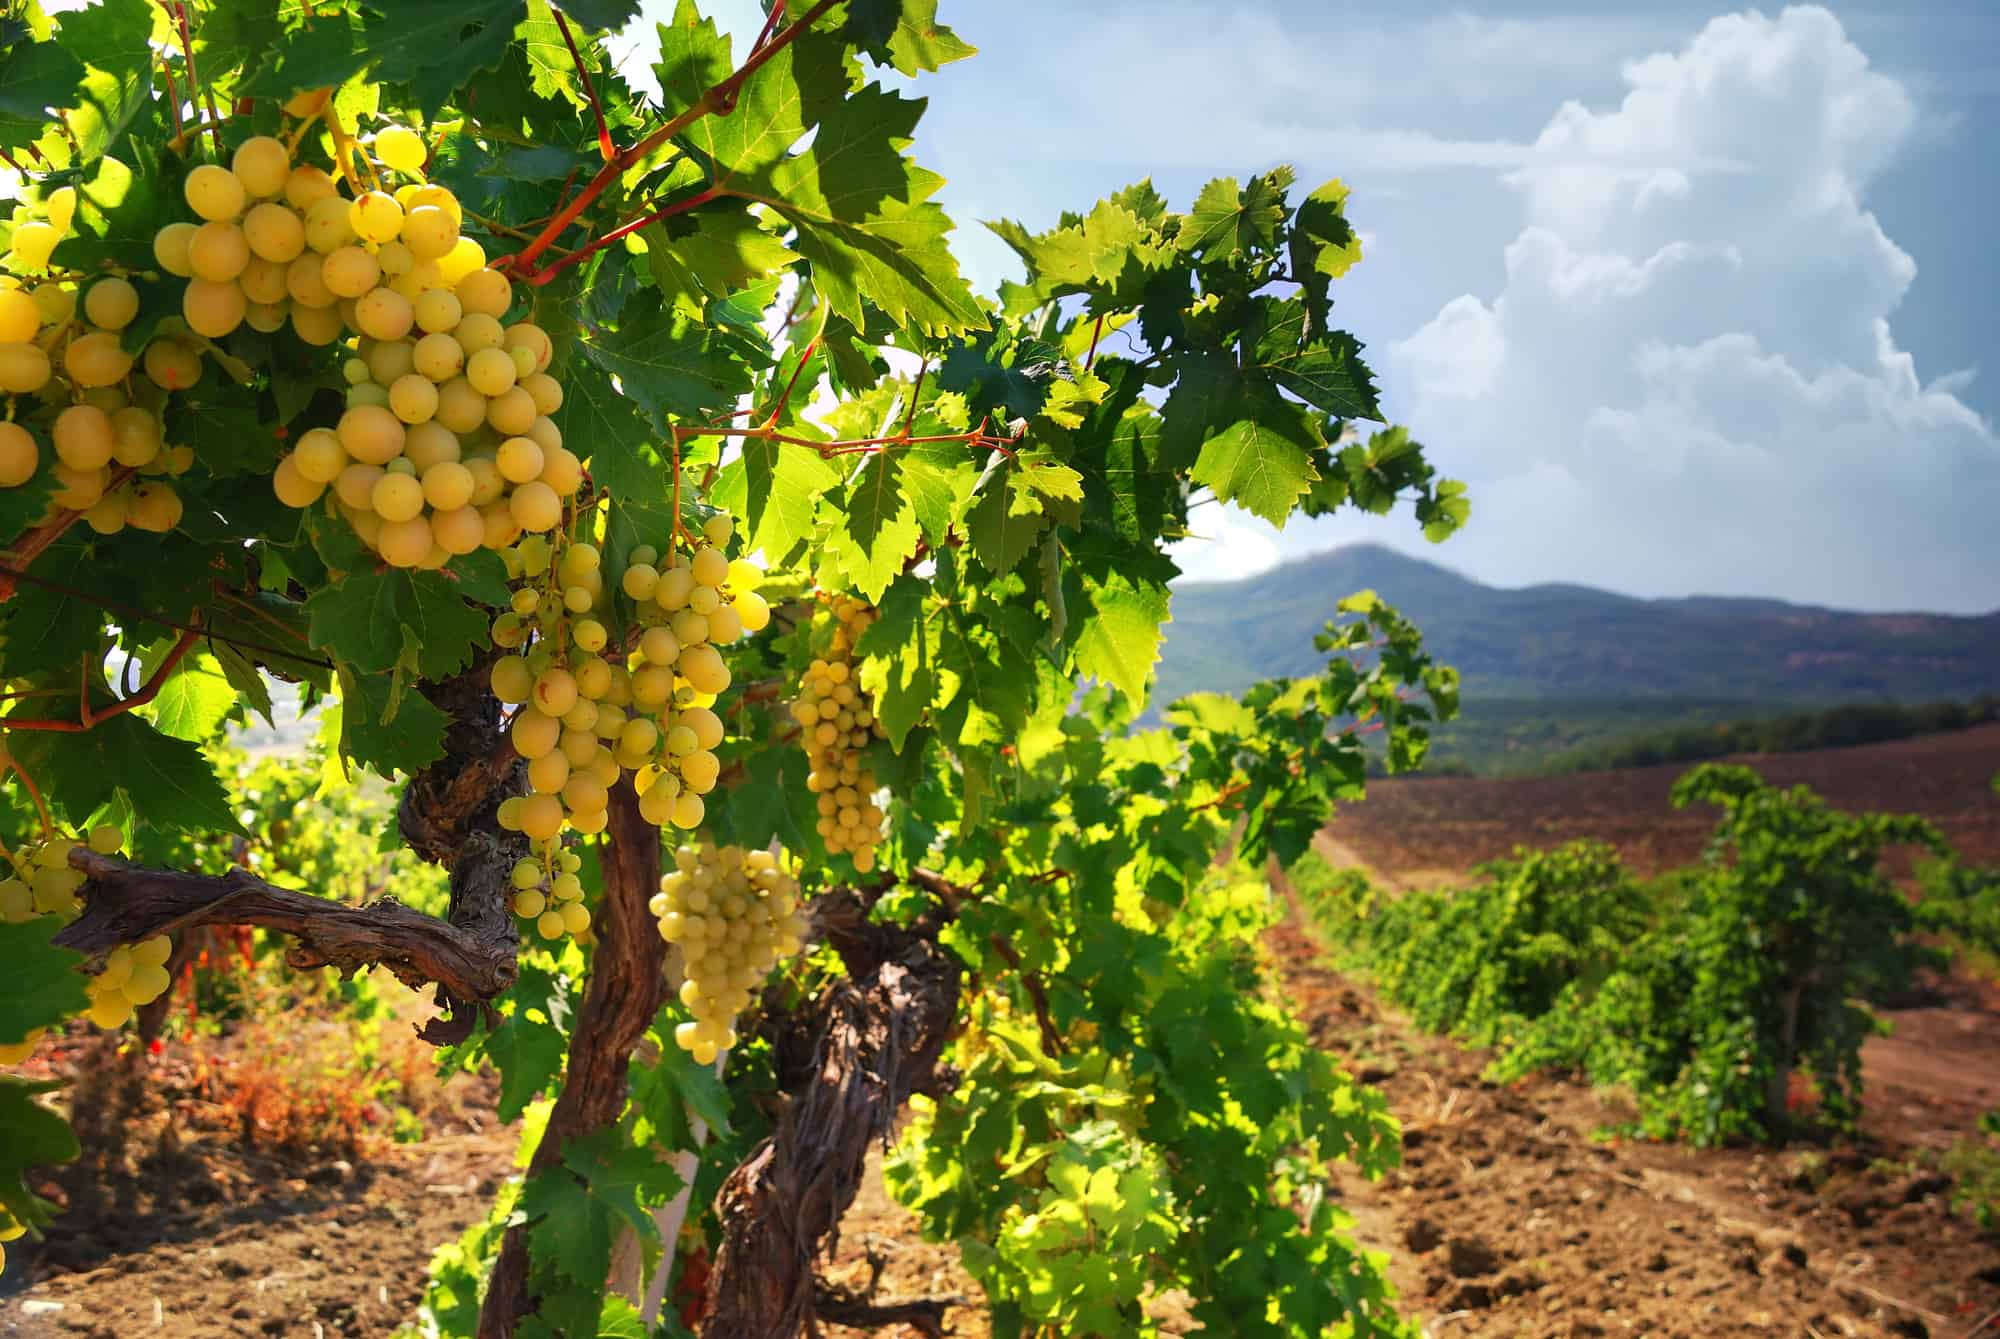 biodynamic Vineyard in napa valley